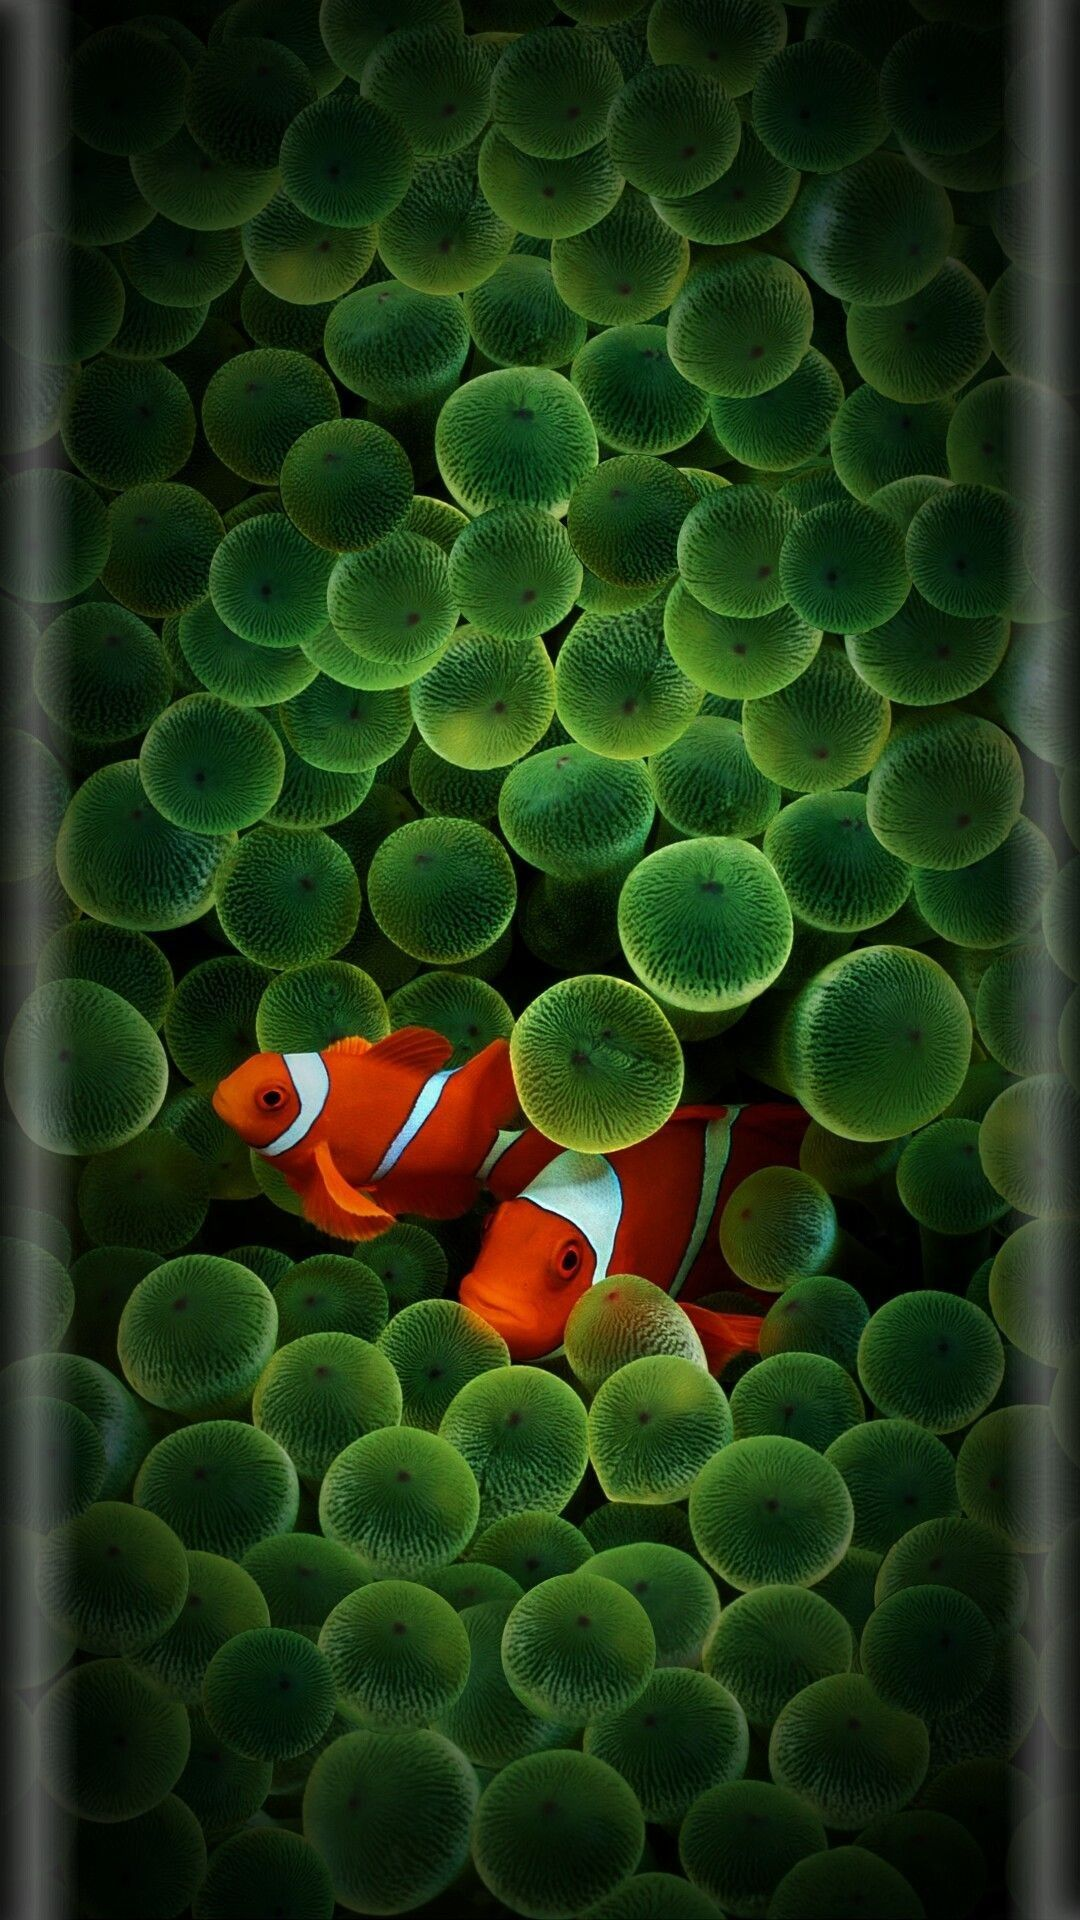 Iphone 5 Clown Fish Wallpaper Hadi Demir Adlı Kullanıcının Samsung S8 Wallpaper